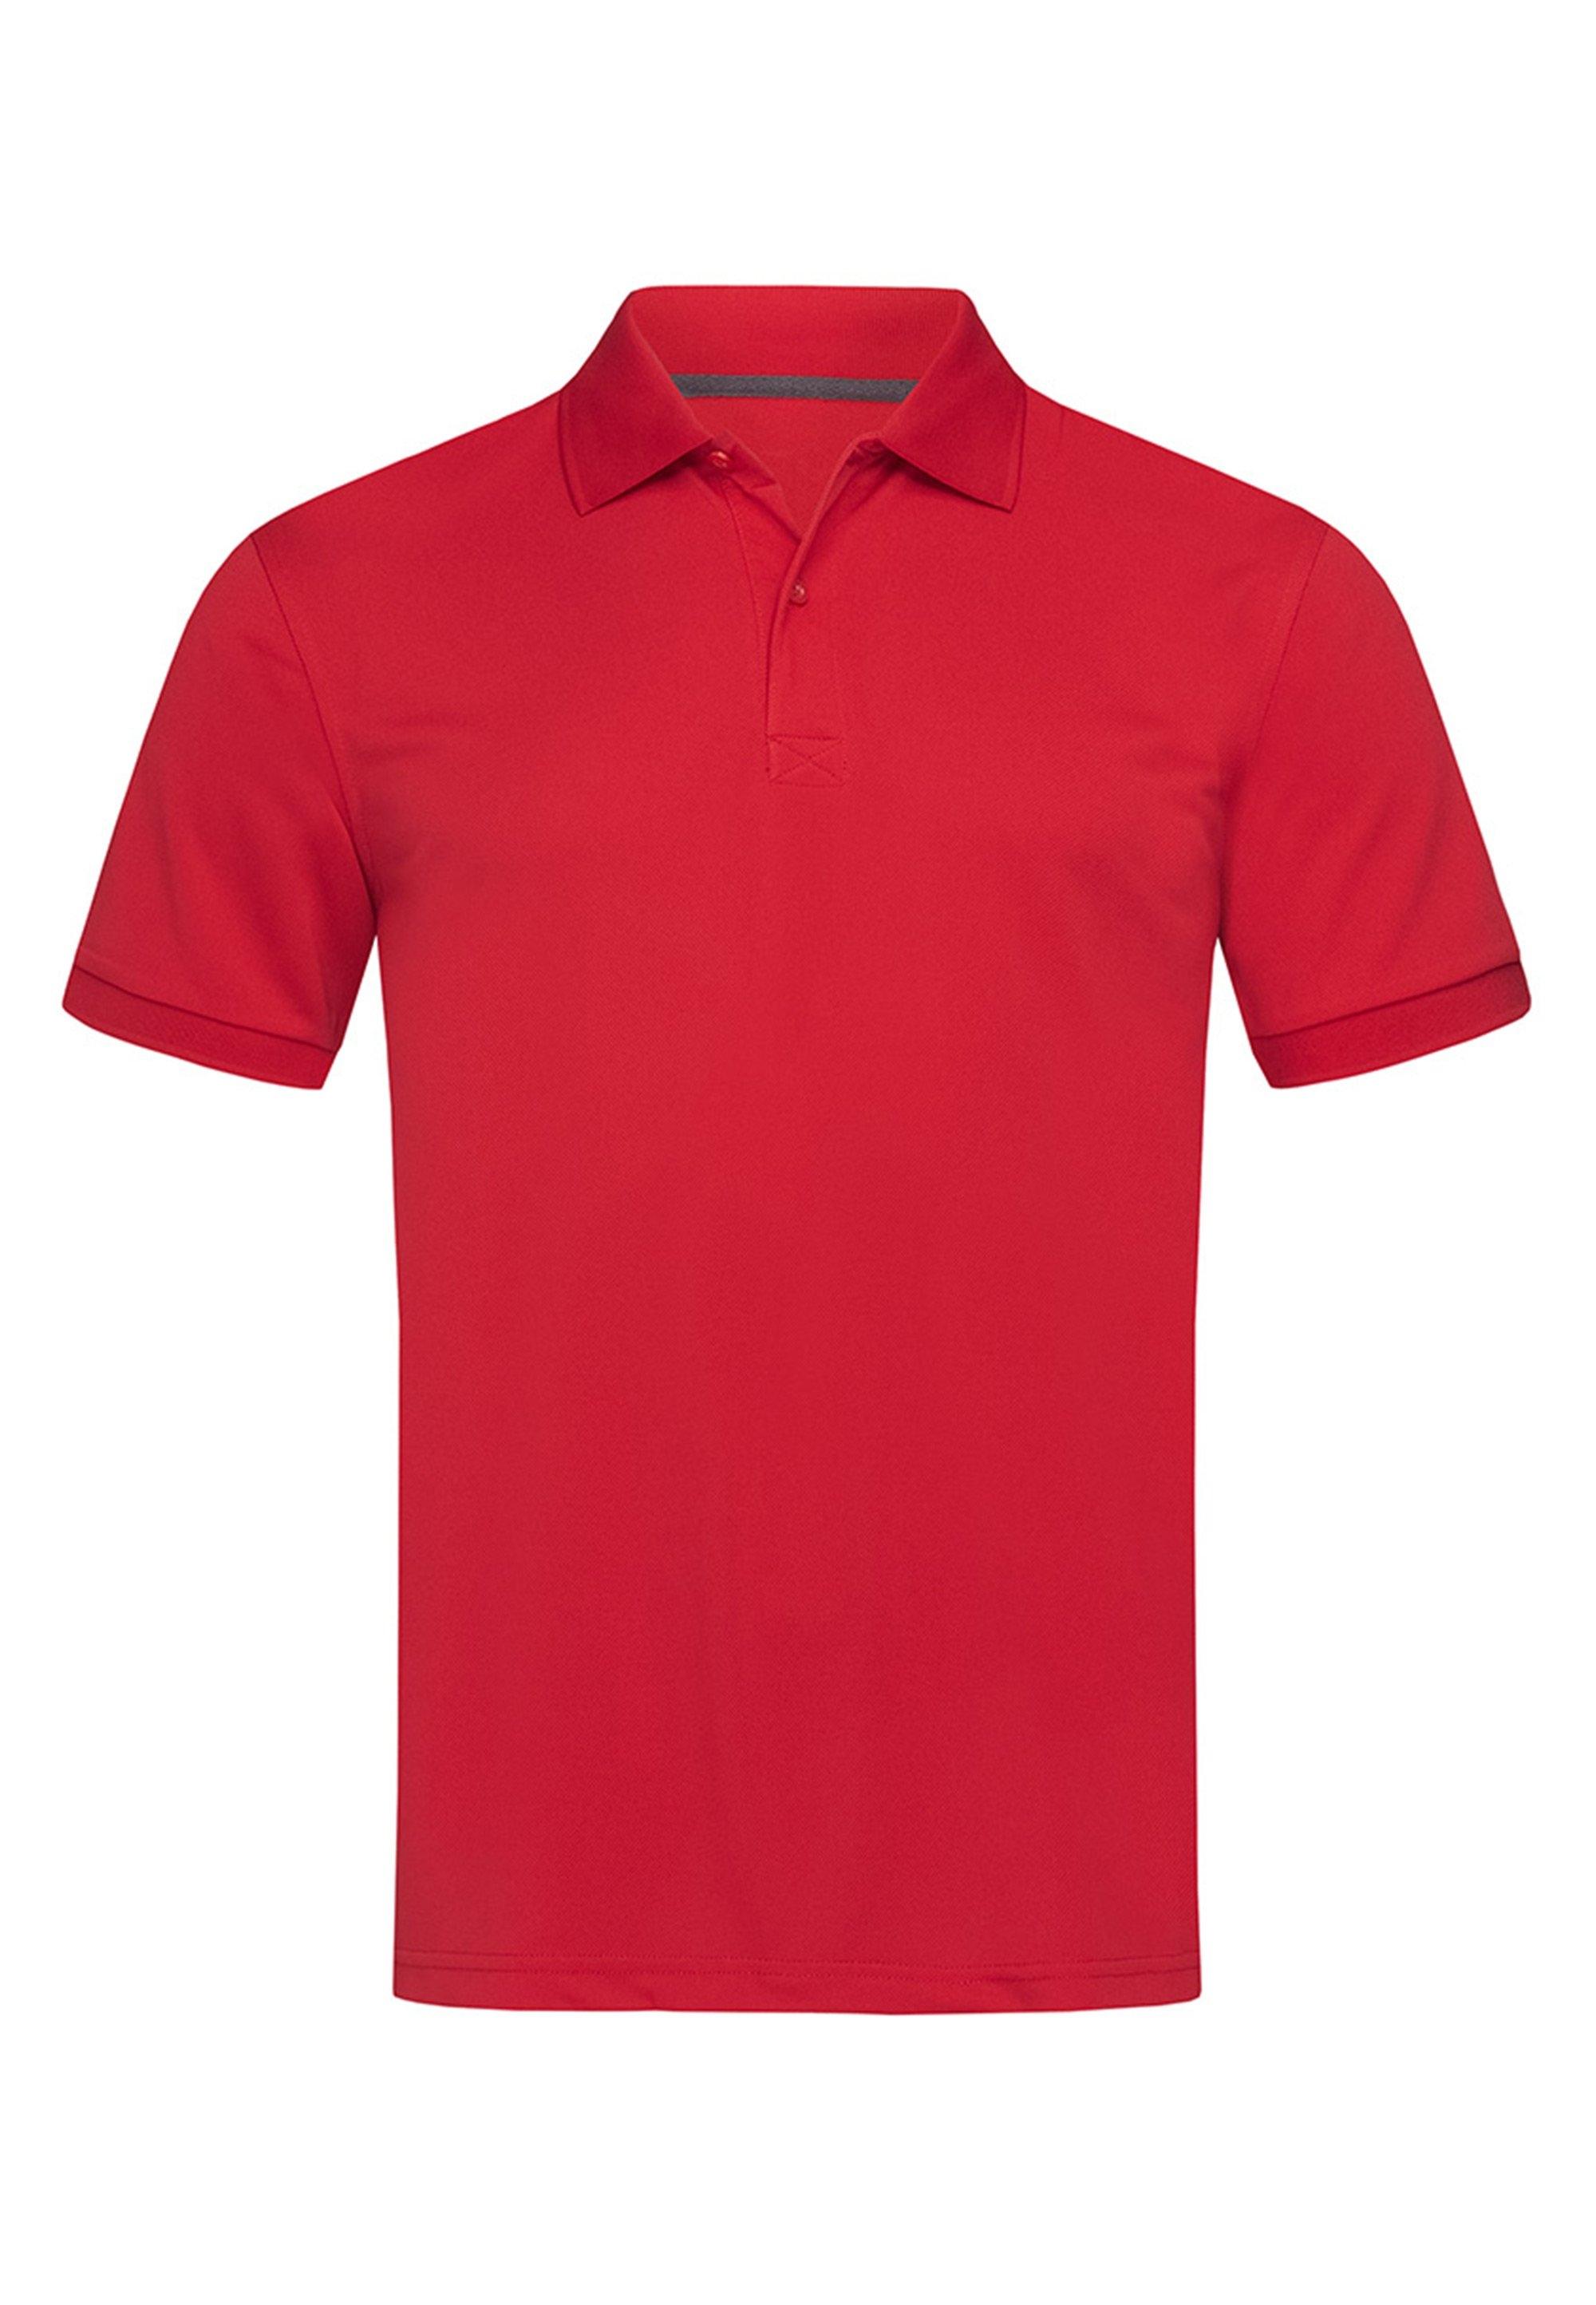 Stedman Shirt bestellen: 30 dagen bedenktijd